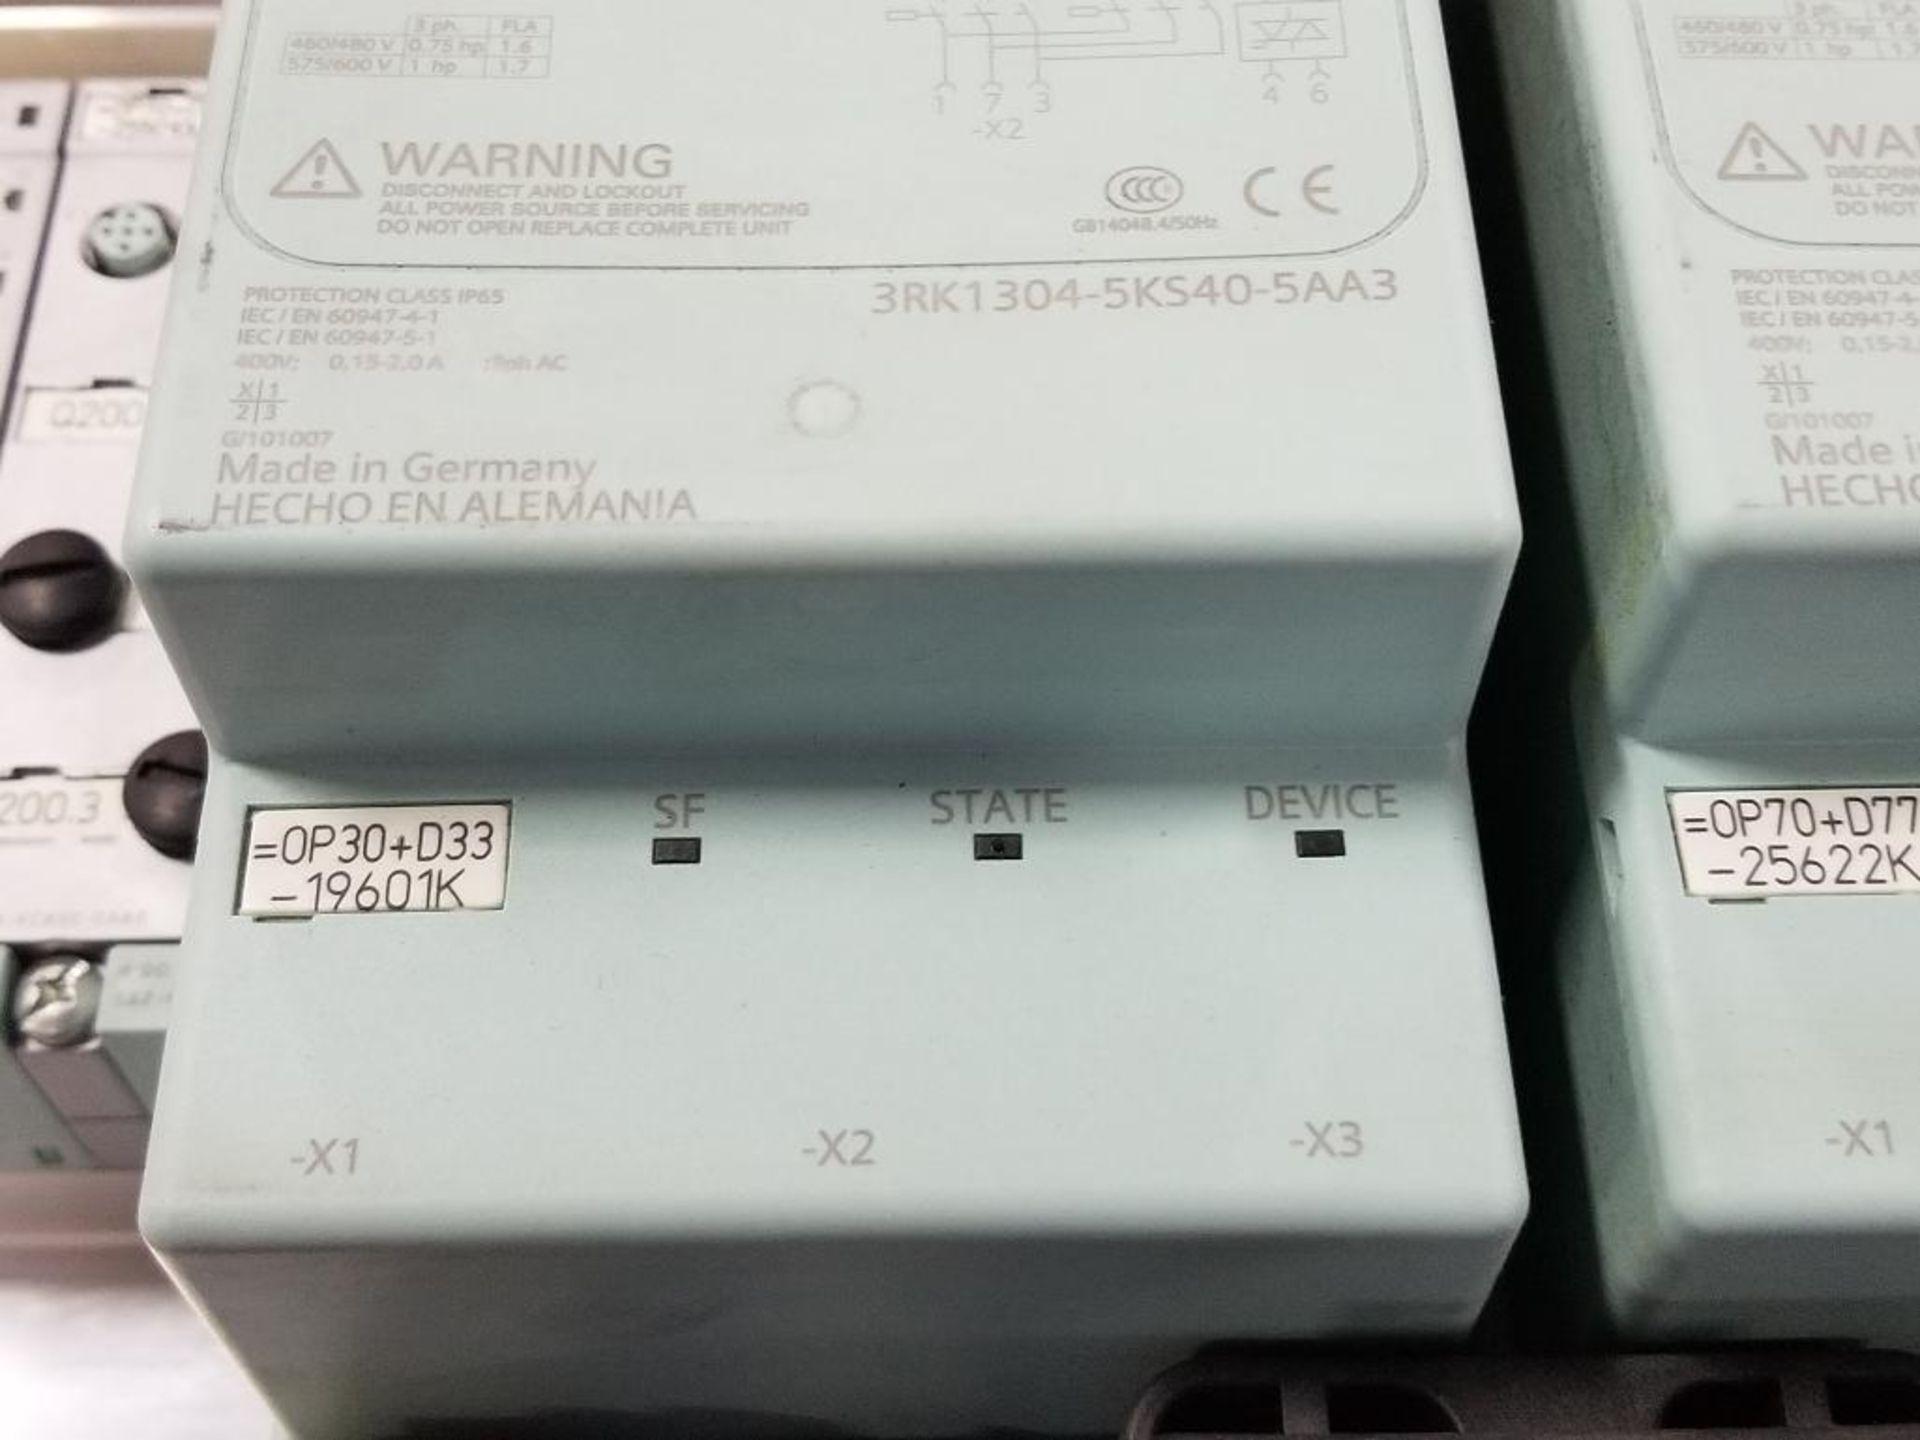 Qty 2 - Siemens RSe-ST 3RK1304-5KS40-5AA3 Reversing starter. - Image 5 of 7